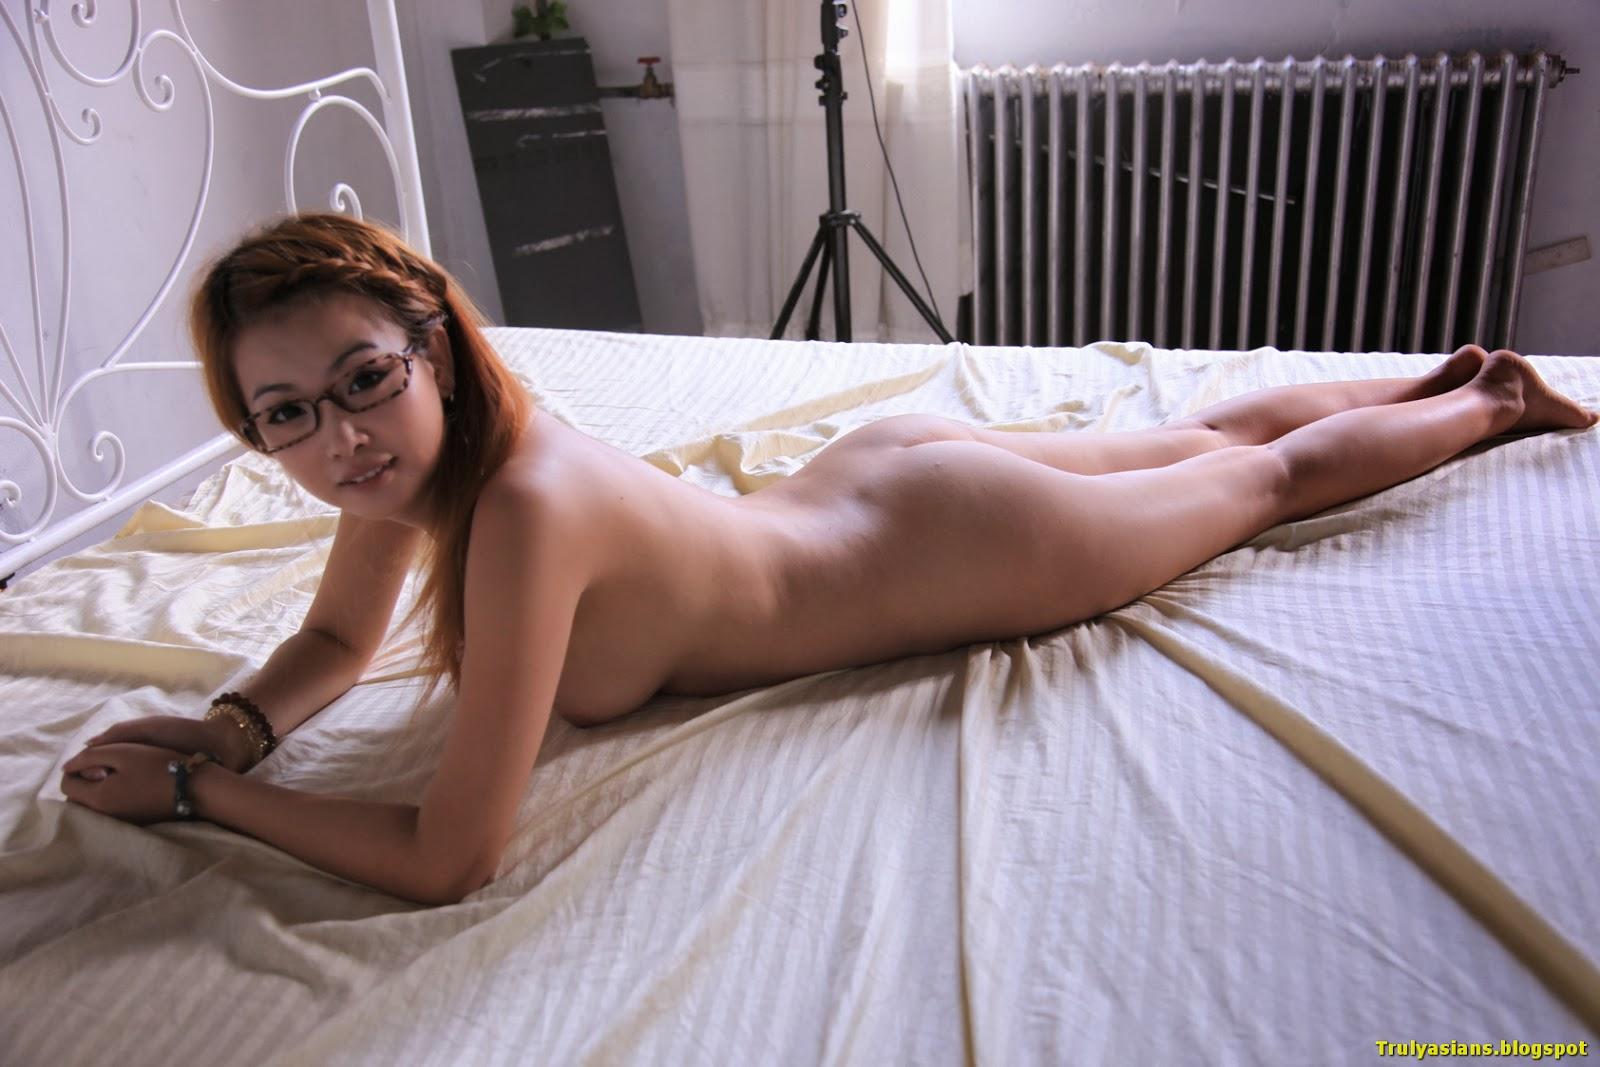 http://i1.wp.com/4.bp.blogspot.com/-l841QFHVQ5w/UjzcOMPV1RI/AAAAAAAAJoY/wd5O1iriYaA/s1600/trulyasians.blogspot+-+Busty+Kinky+Chinese+Girl+YouDi+Posing+and+spreading+158.jpg